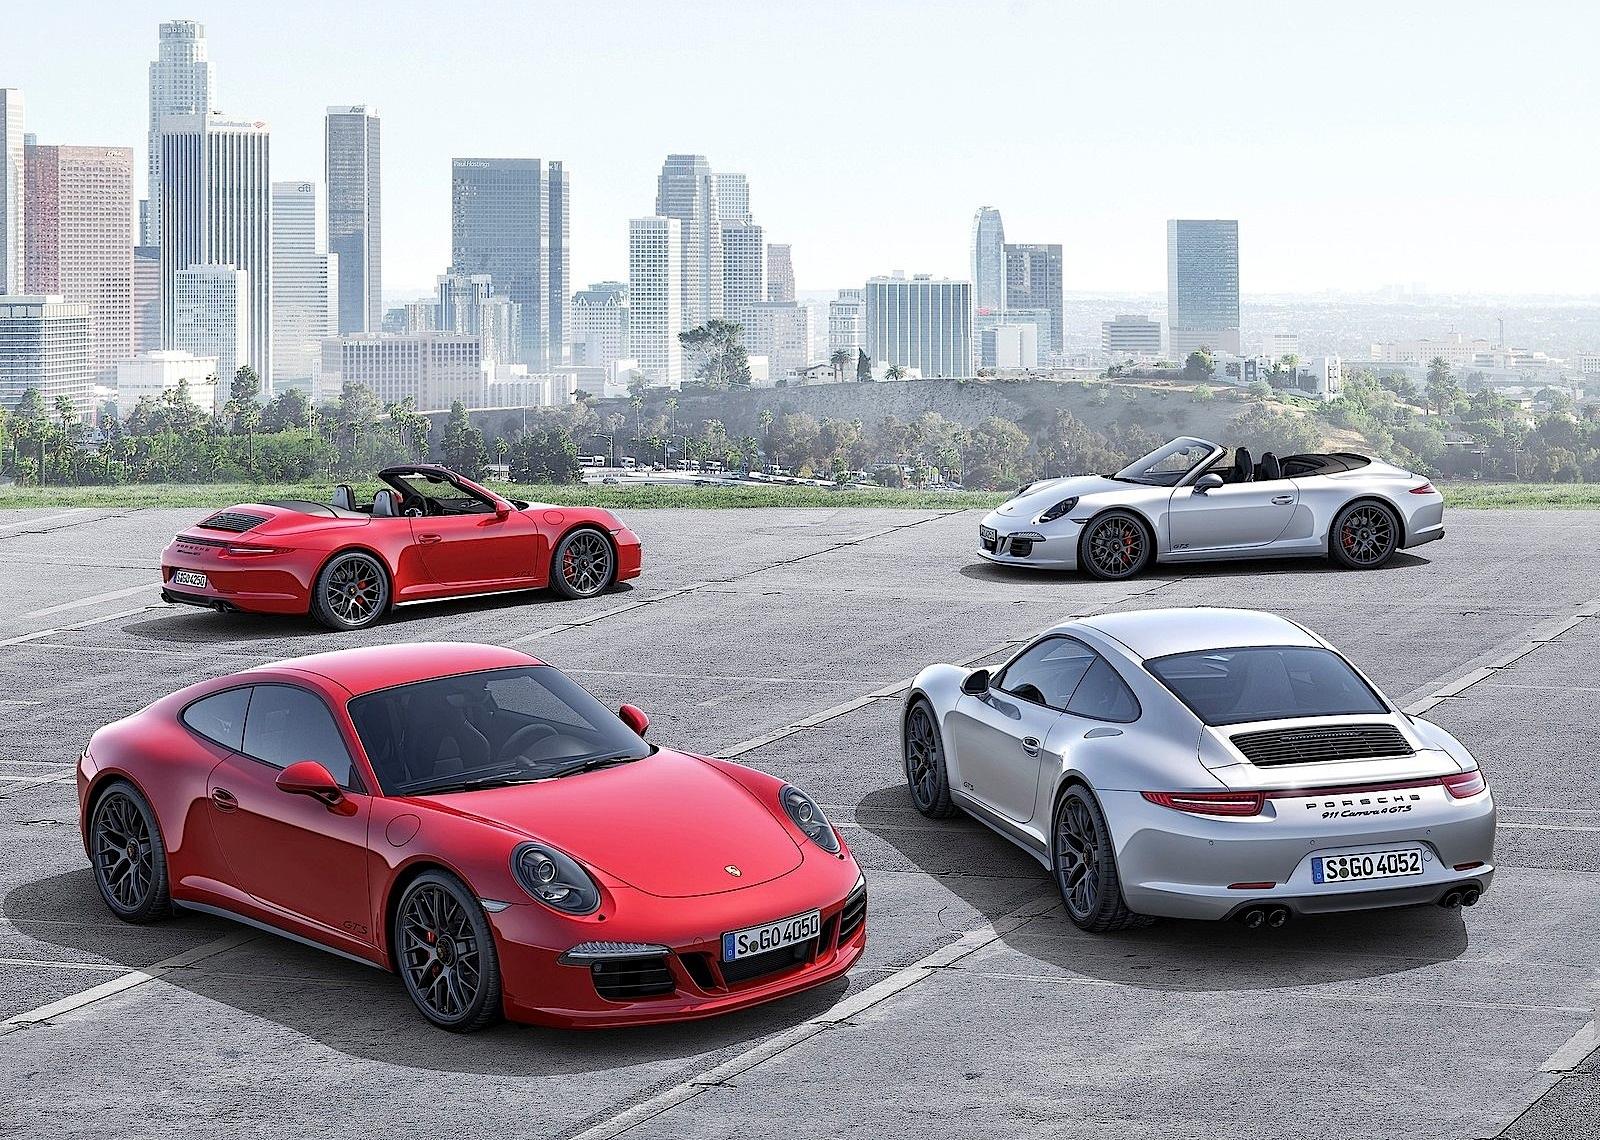 porsche 911 carrera 4 gts cabriolet specs photos 2014 2015 2016 2017 2018 2019. Black Bedroom Furniture Sets. Home Design Ideas